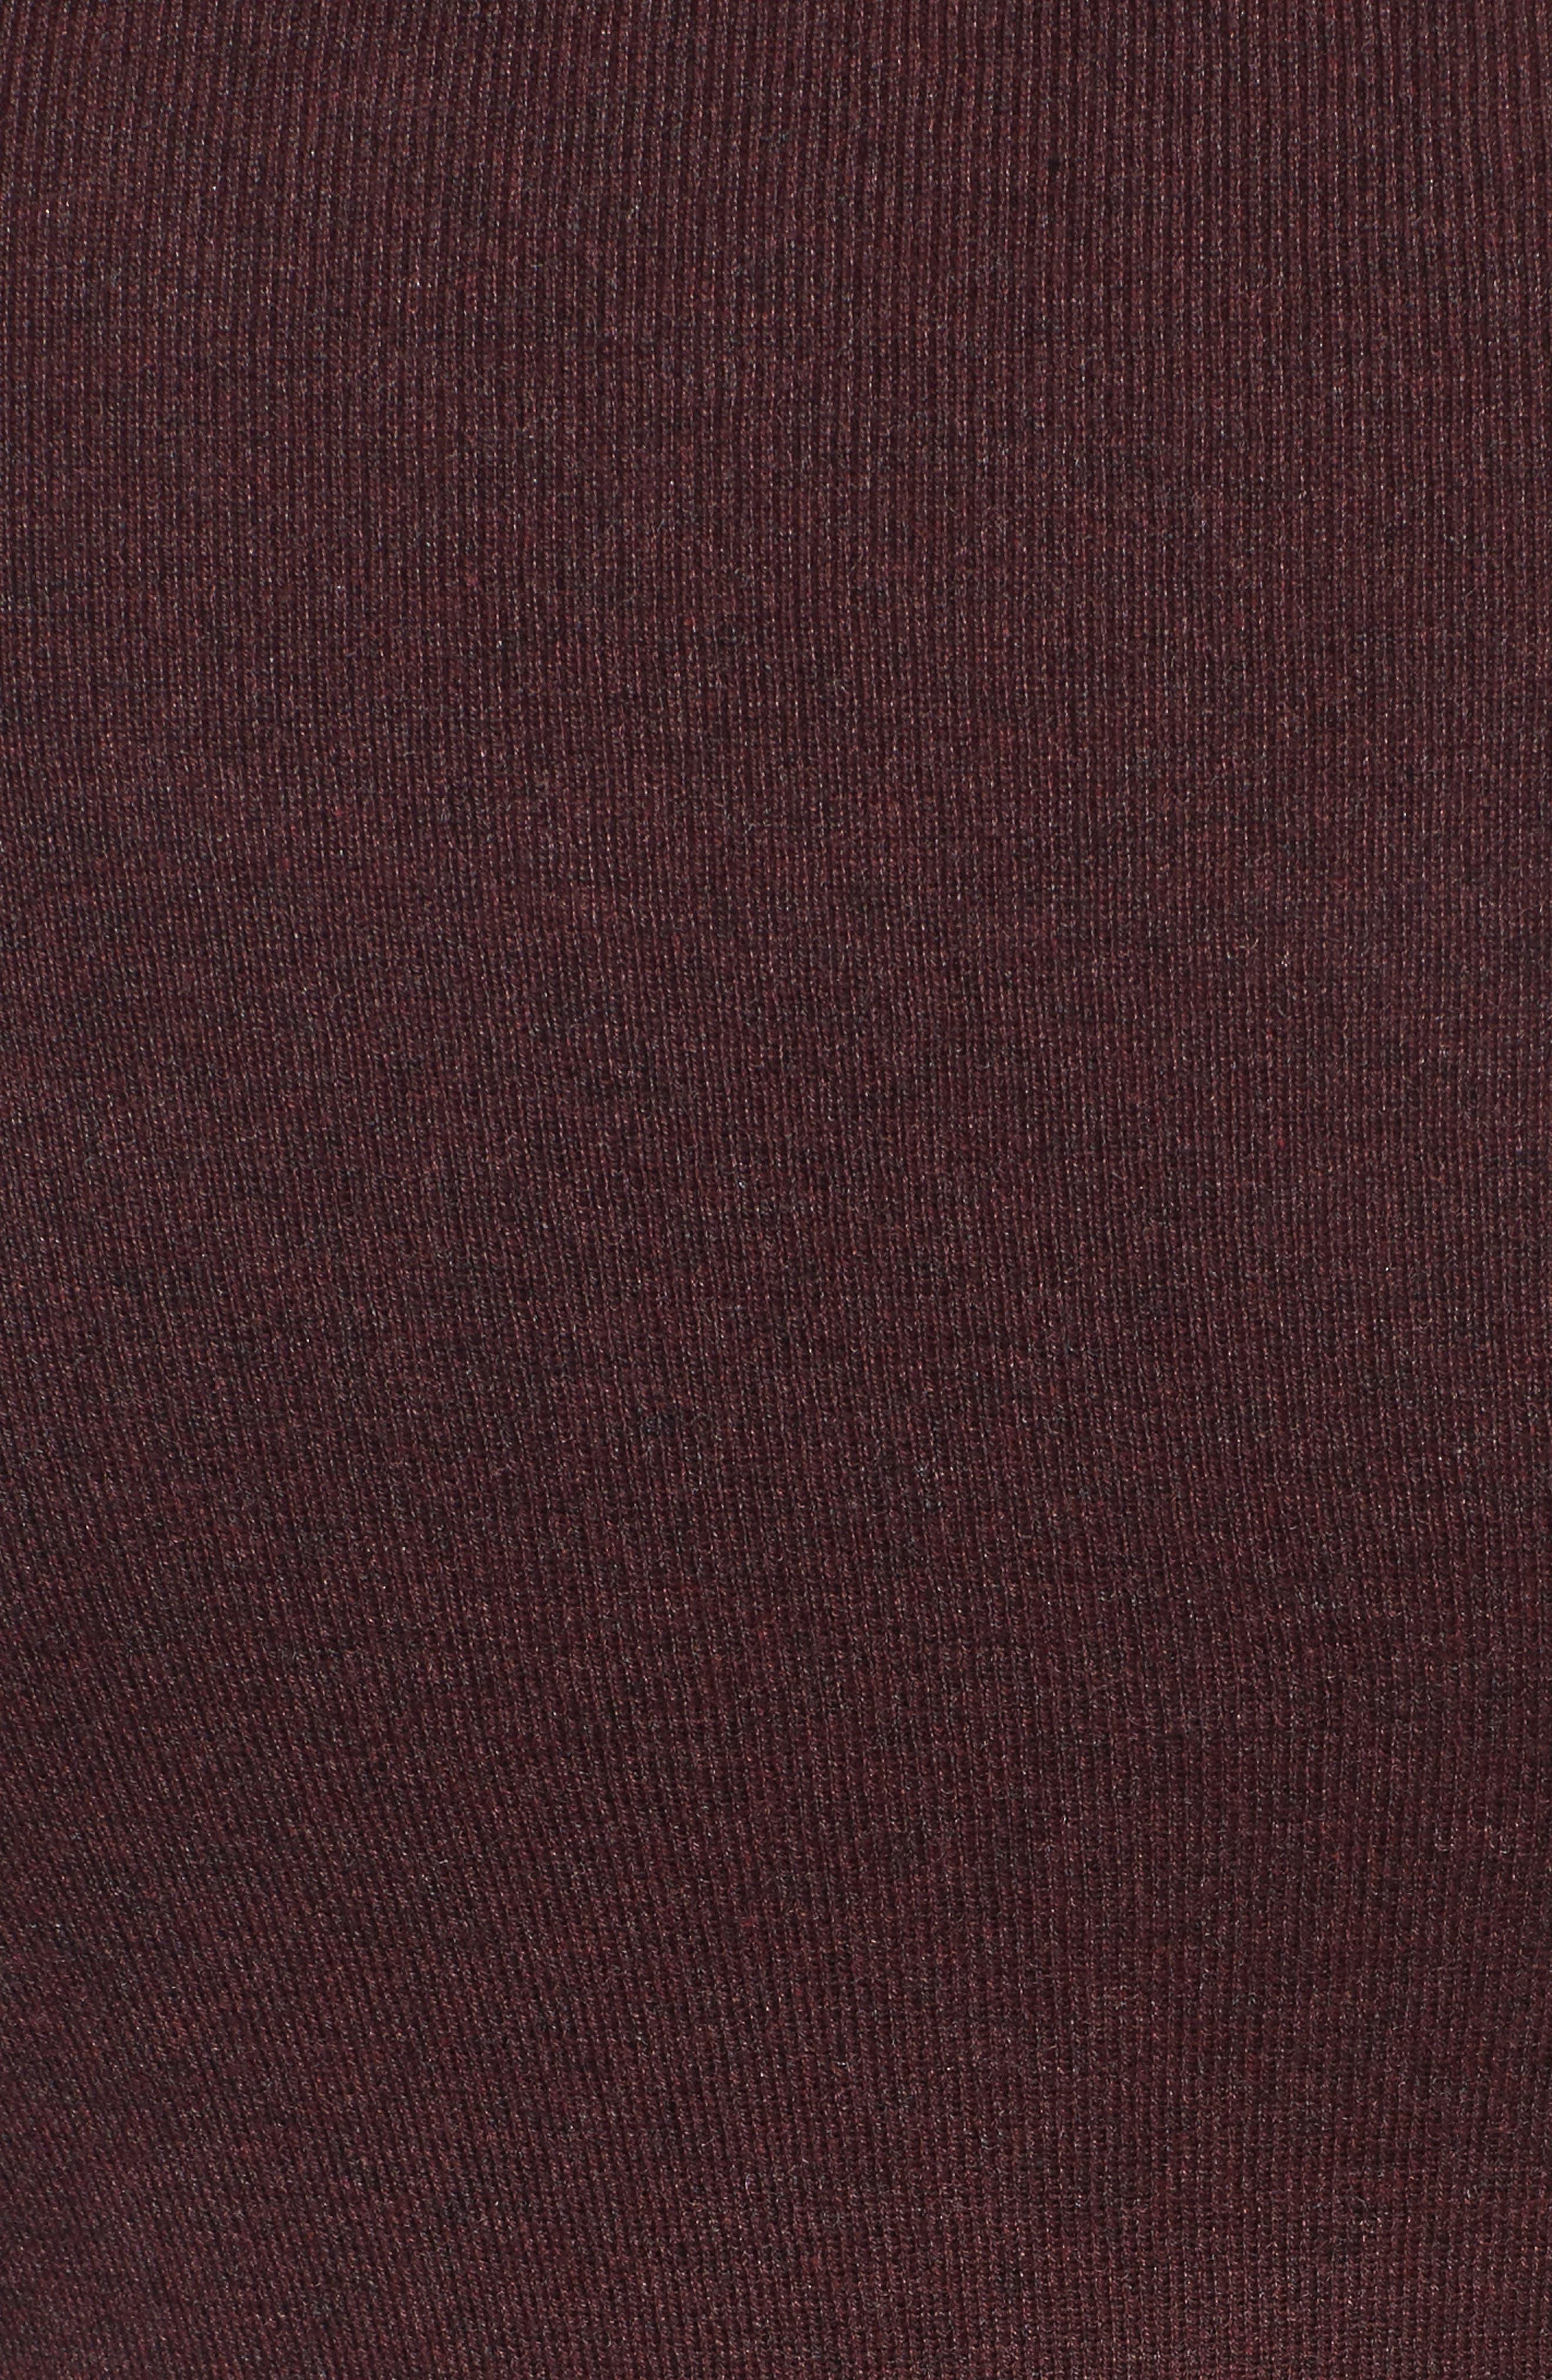 4-Way Convertible Cardigan,                             Alternate thumbnail 5, color,                             Wine